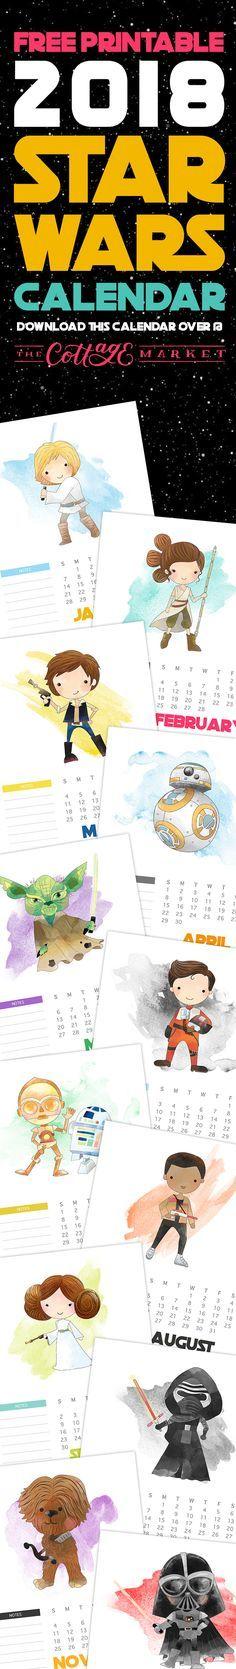 Free printable 2018 Star Wars calendar #printablecalendar #freecalendar